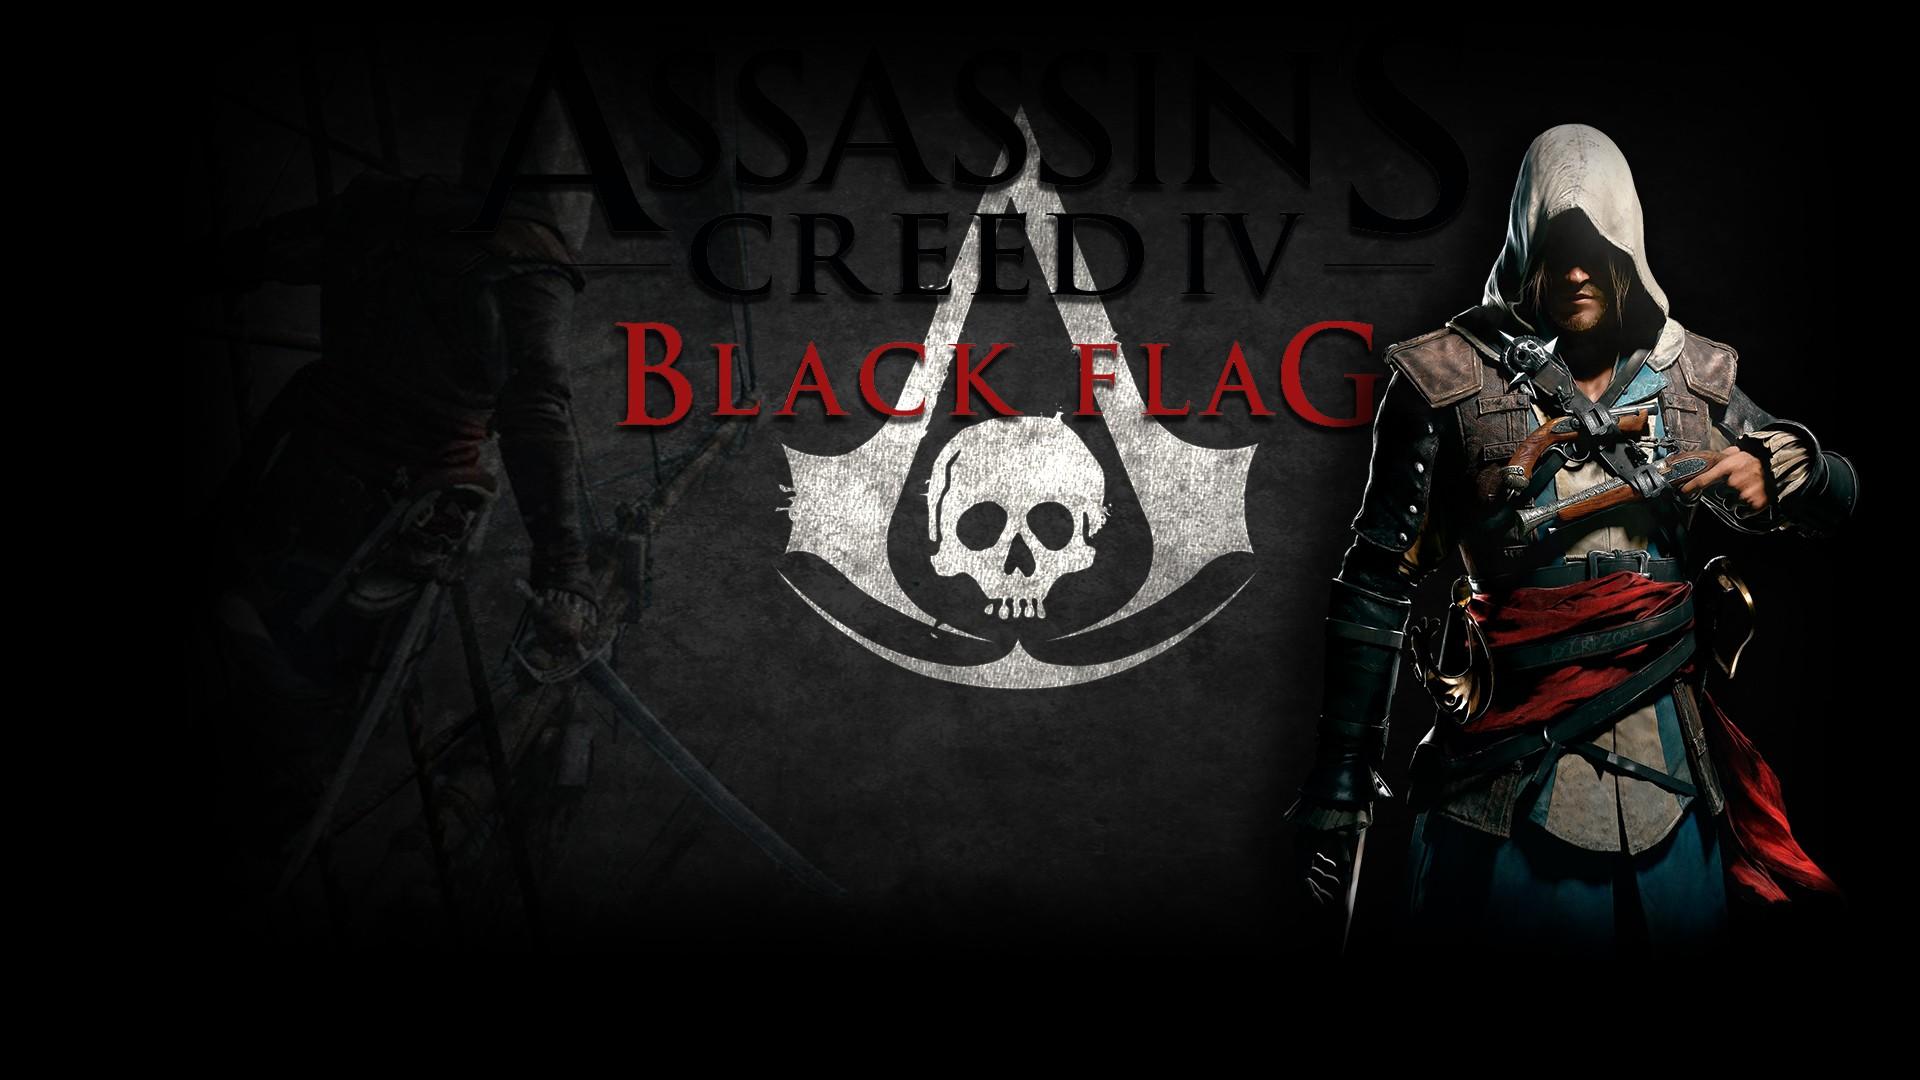 assassins creed black flag wallpapers wallpapersafari